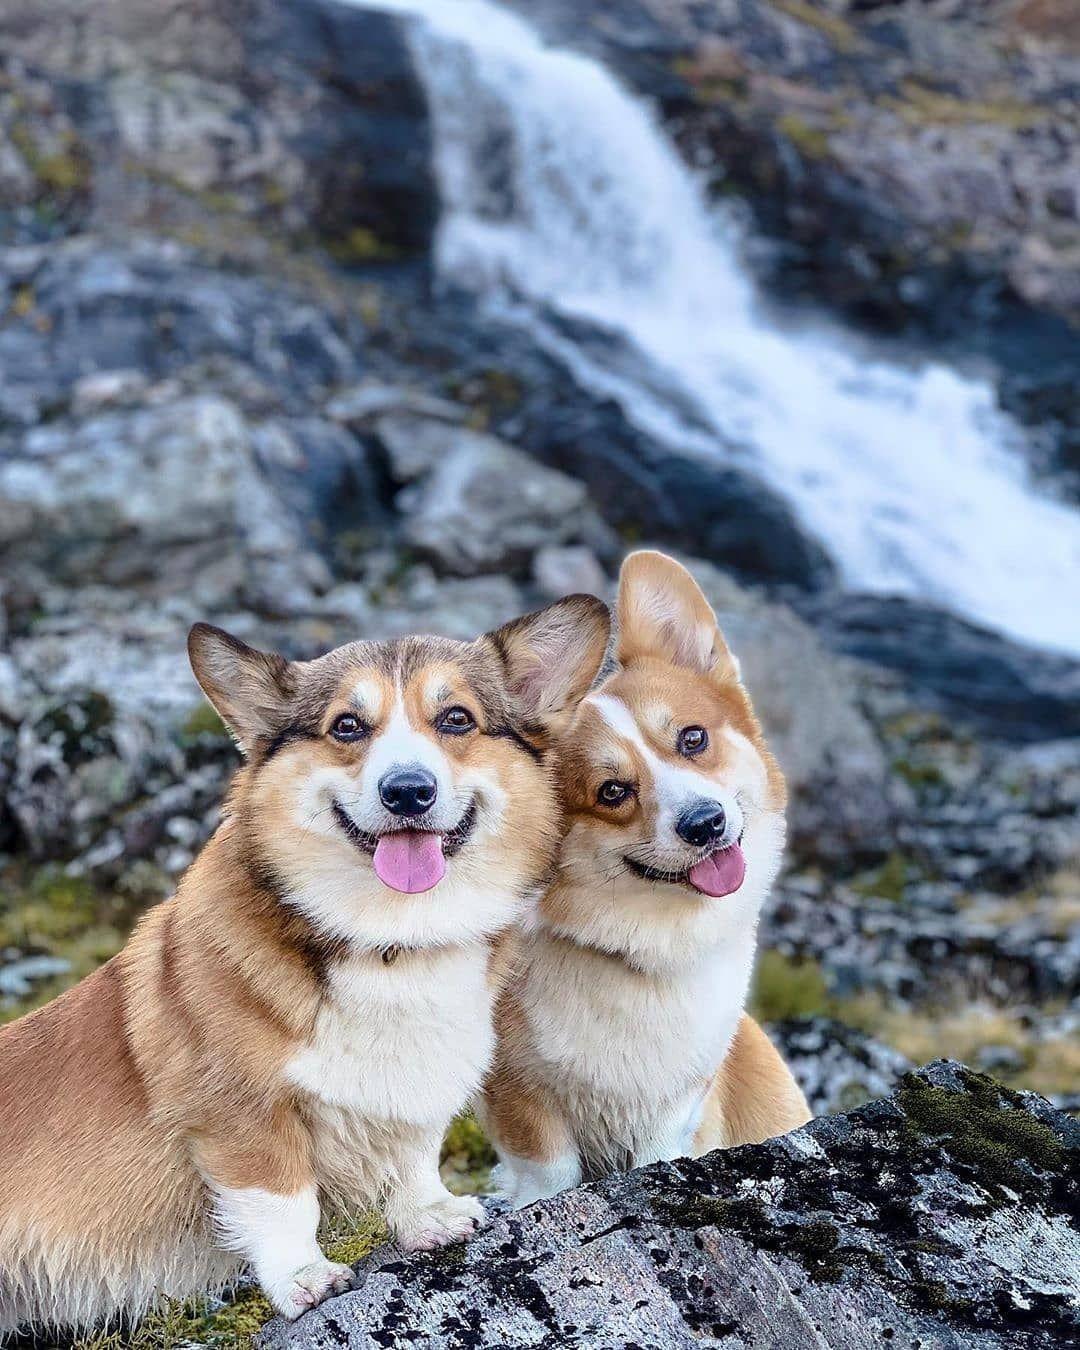 Pin By Nikola Chun On Animals In 2020 With Images Corgi Dog Corgi Cute Corgi